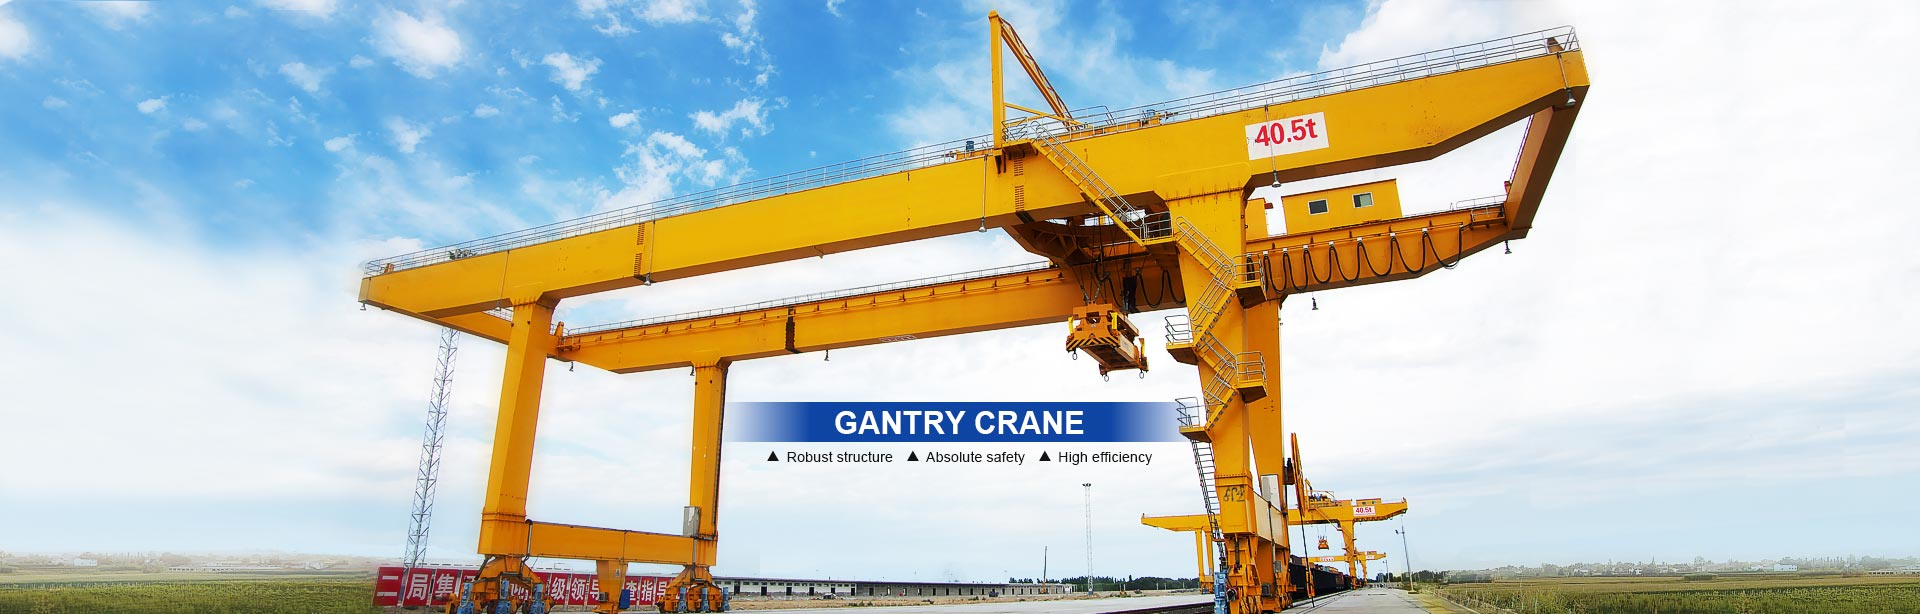 electric hoist,overhead crane,gantry crane,work platform